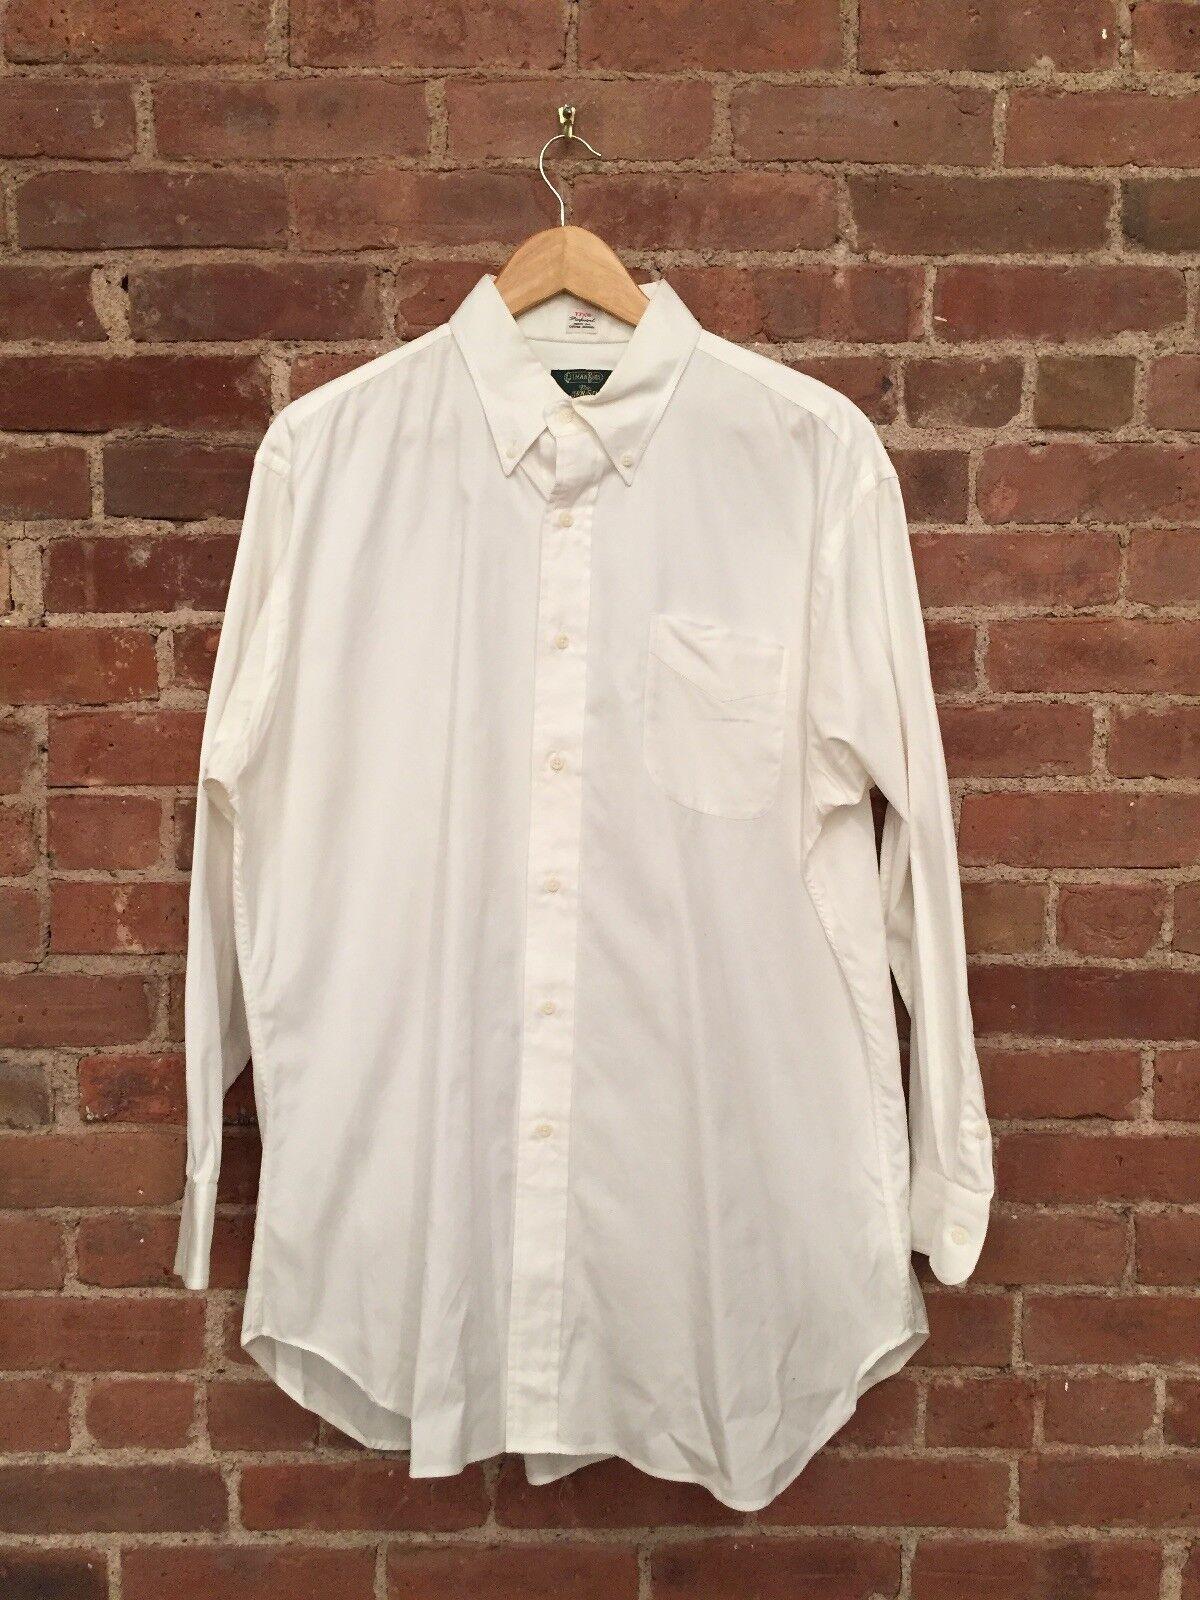 Gitman Bros For The Hound, Pinpoint Oxford Dress Shirt Sz 17 33